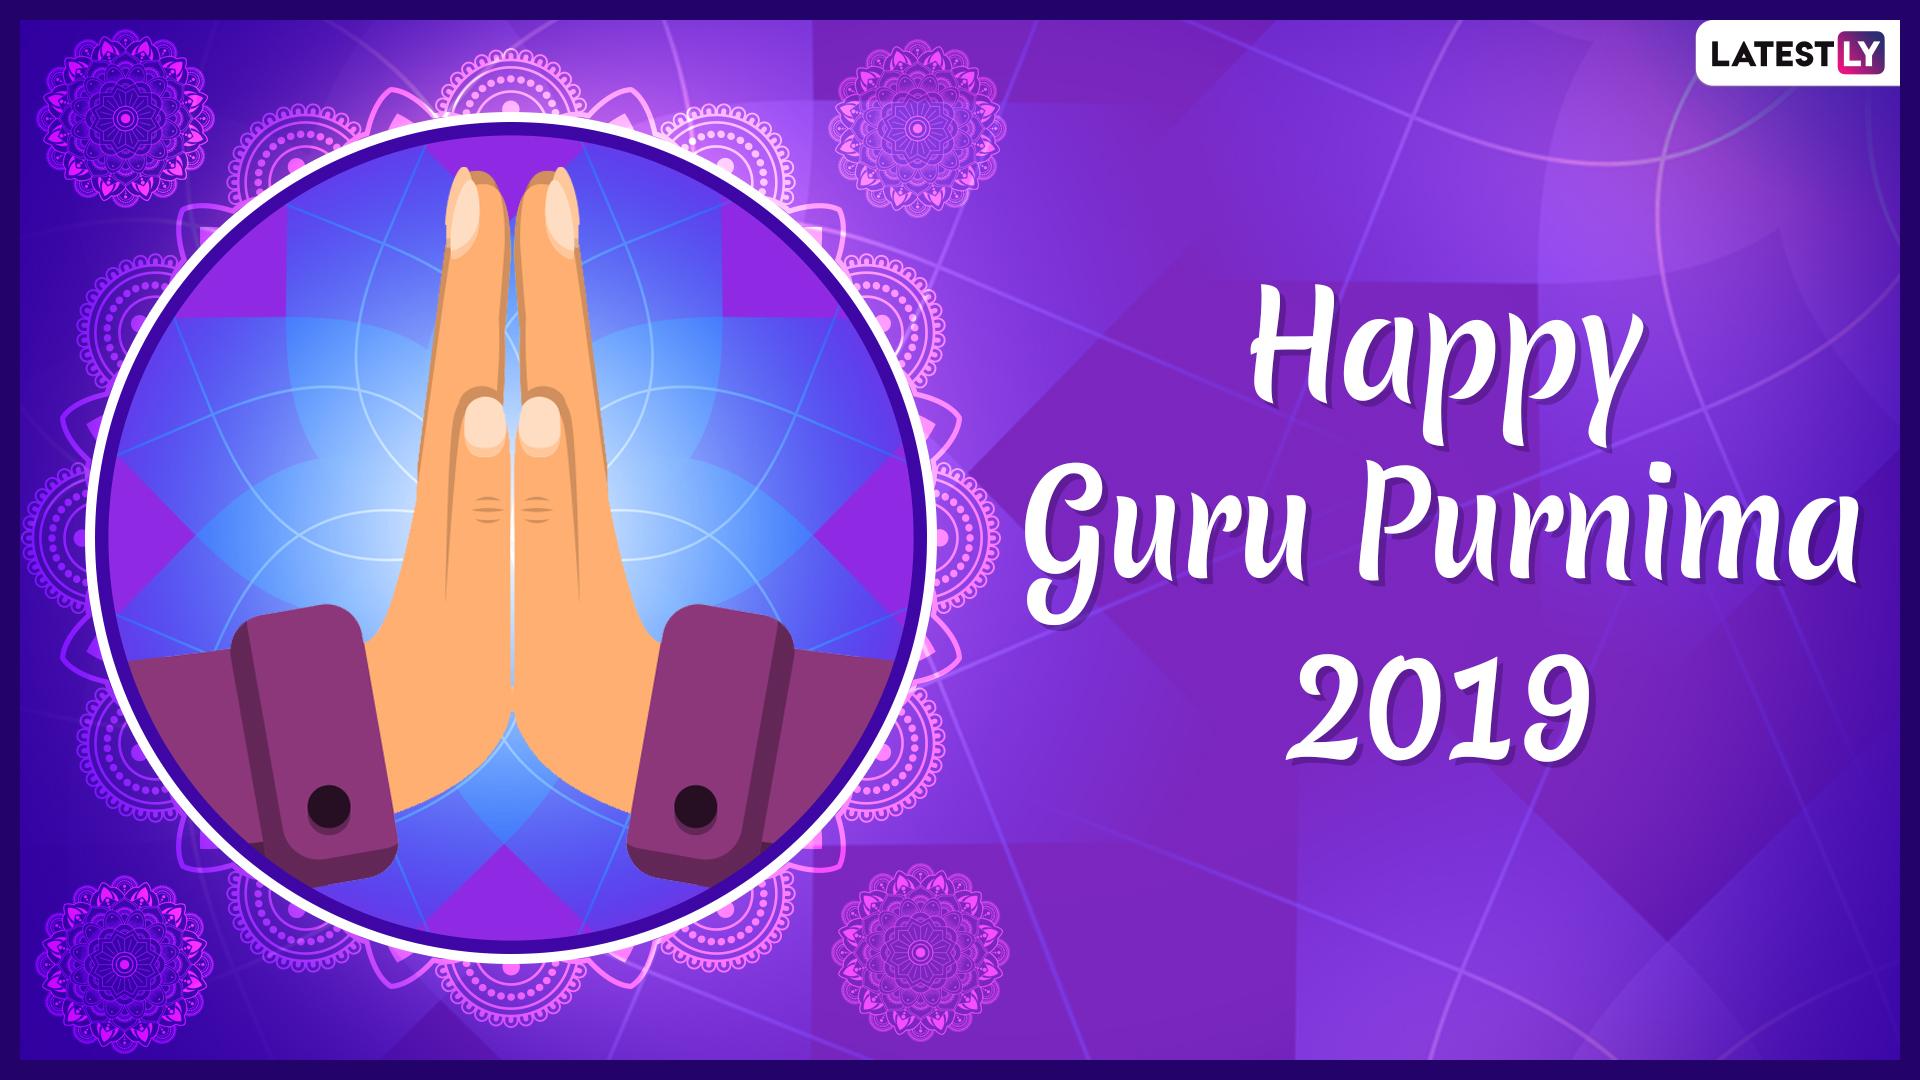 wallpaper hd guru purnima images hd download guru purnima images with quotes in hindi guru purnima images gif guru purnima images free download